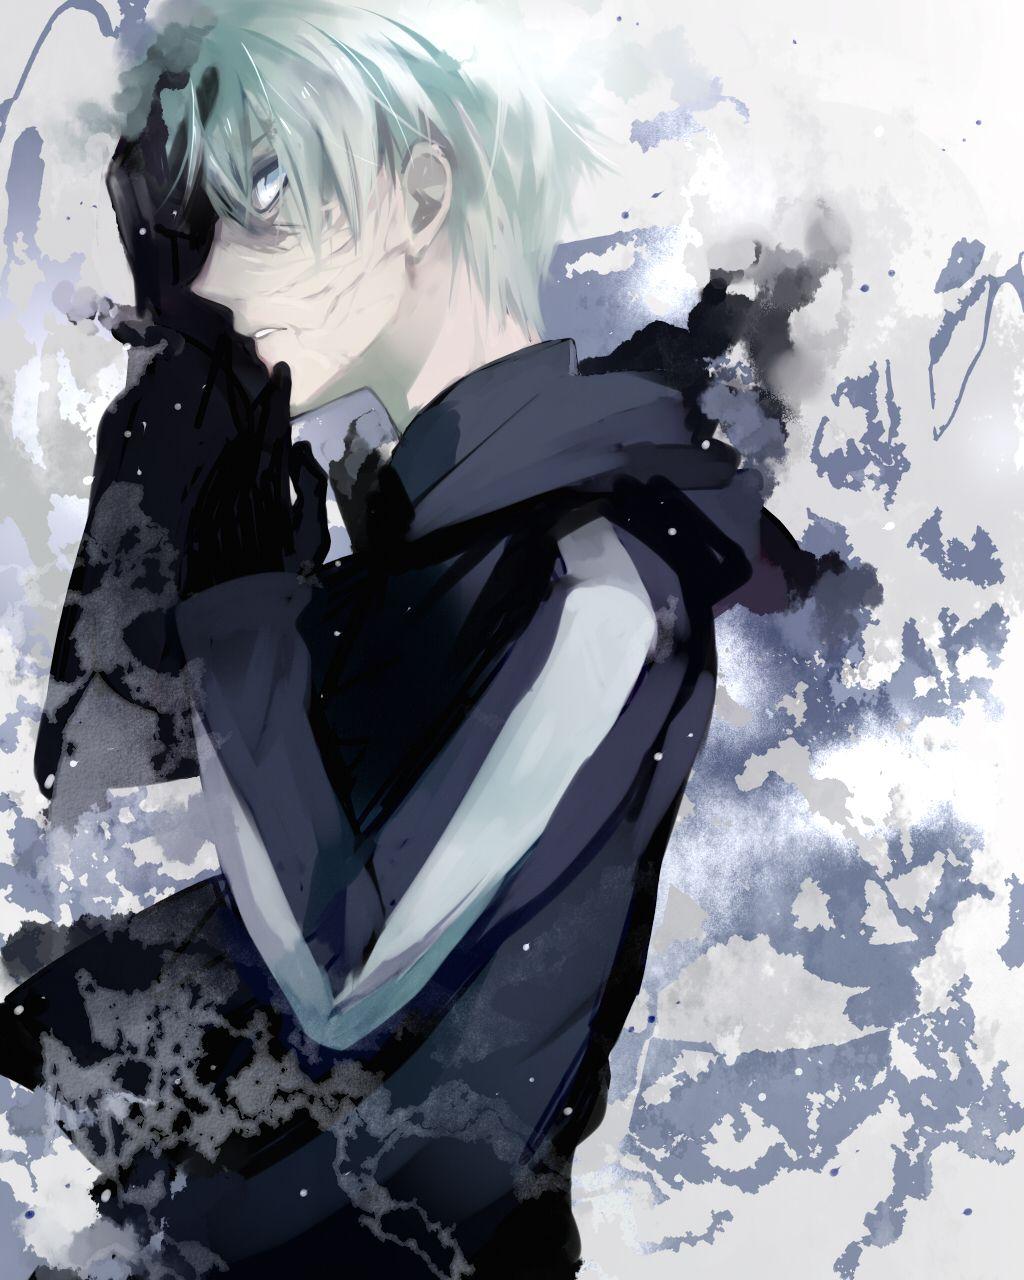 Fate Zero (With images) Anime, Fate zero, Kariya